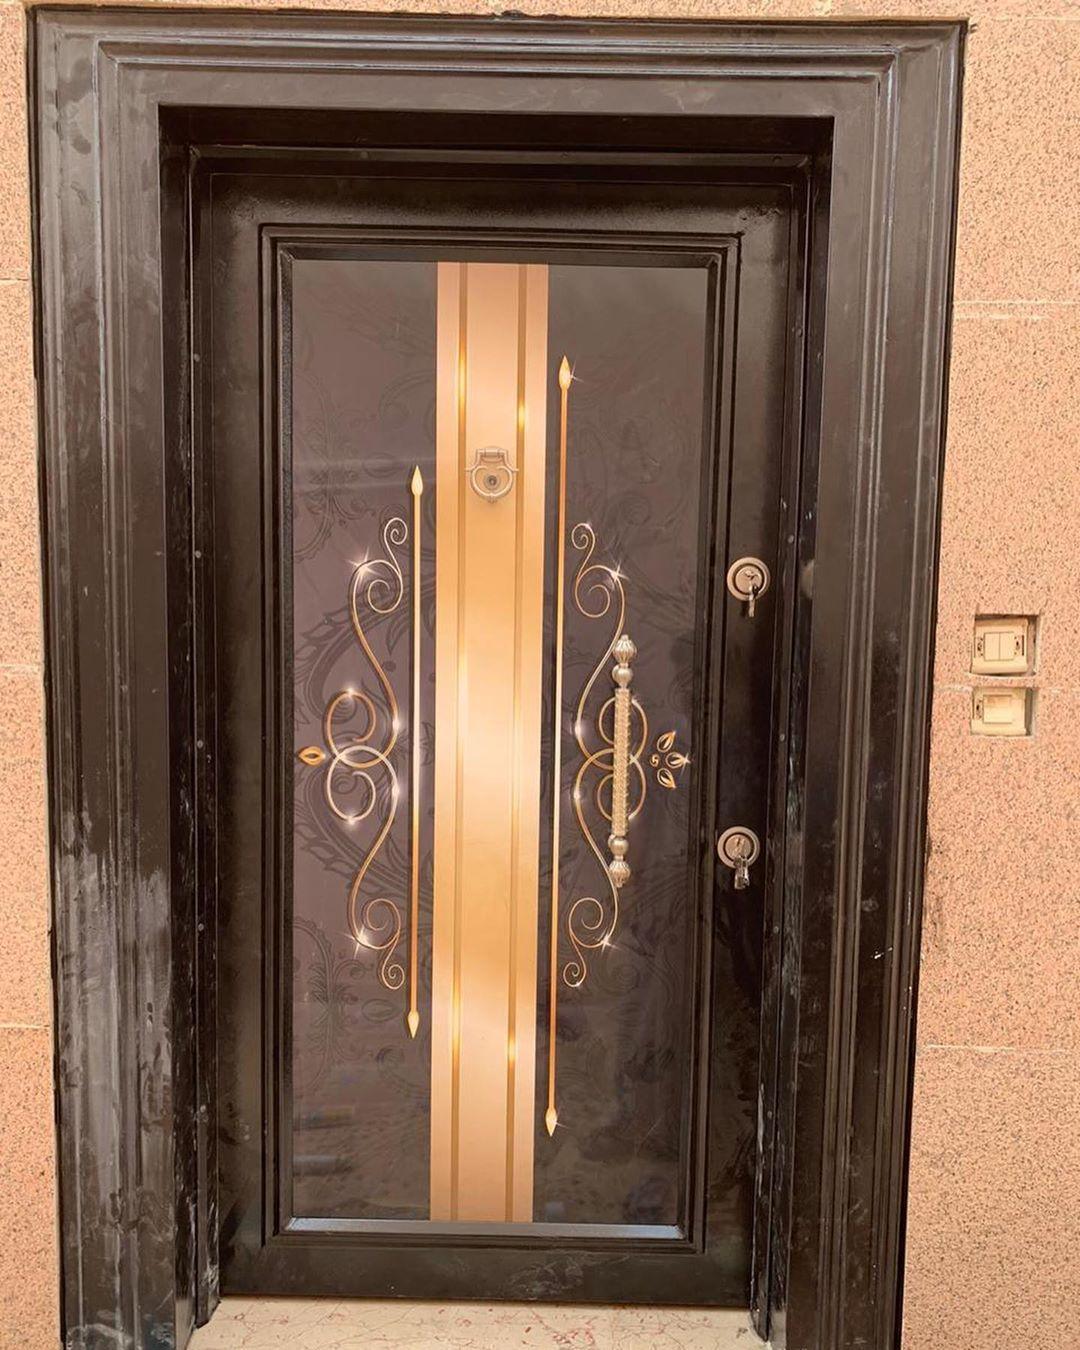 Tumblr In 2020 Steel Doors Tabuk Dammam